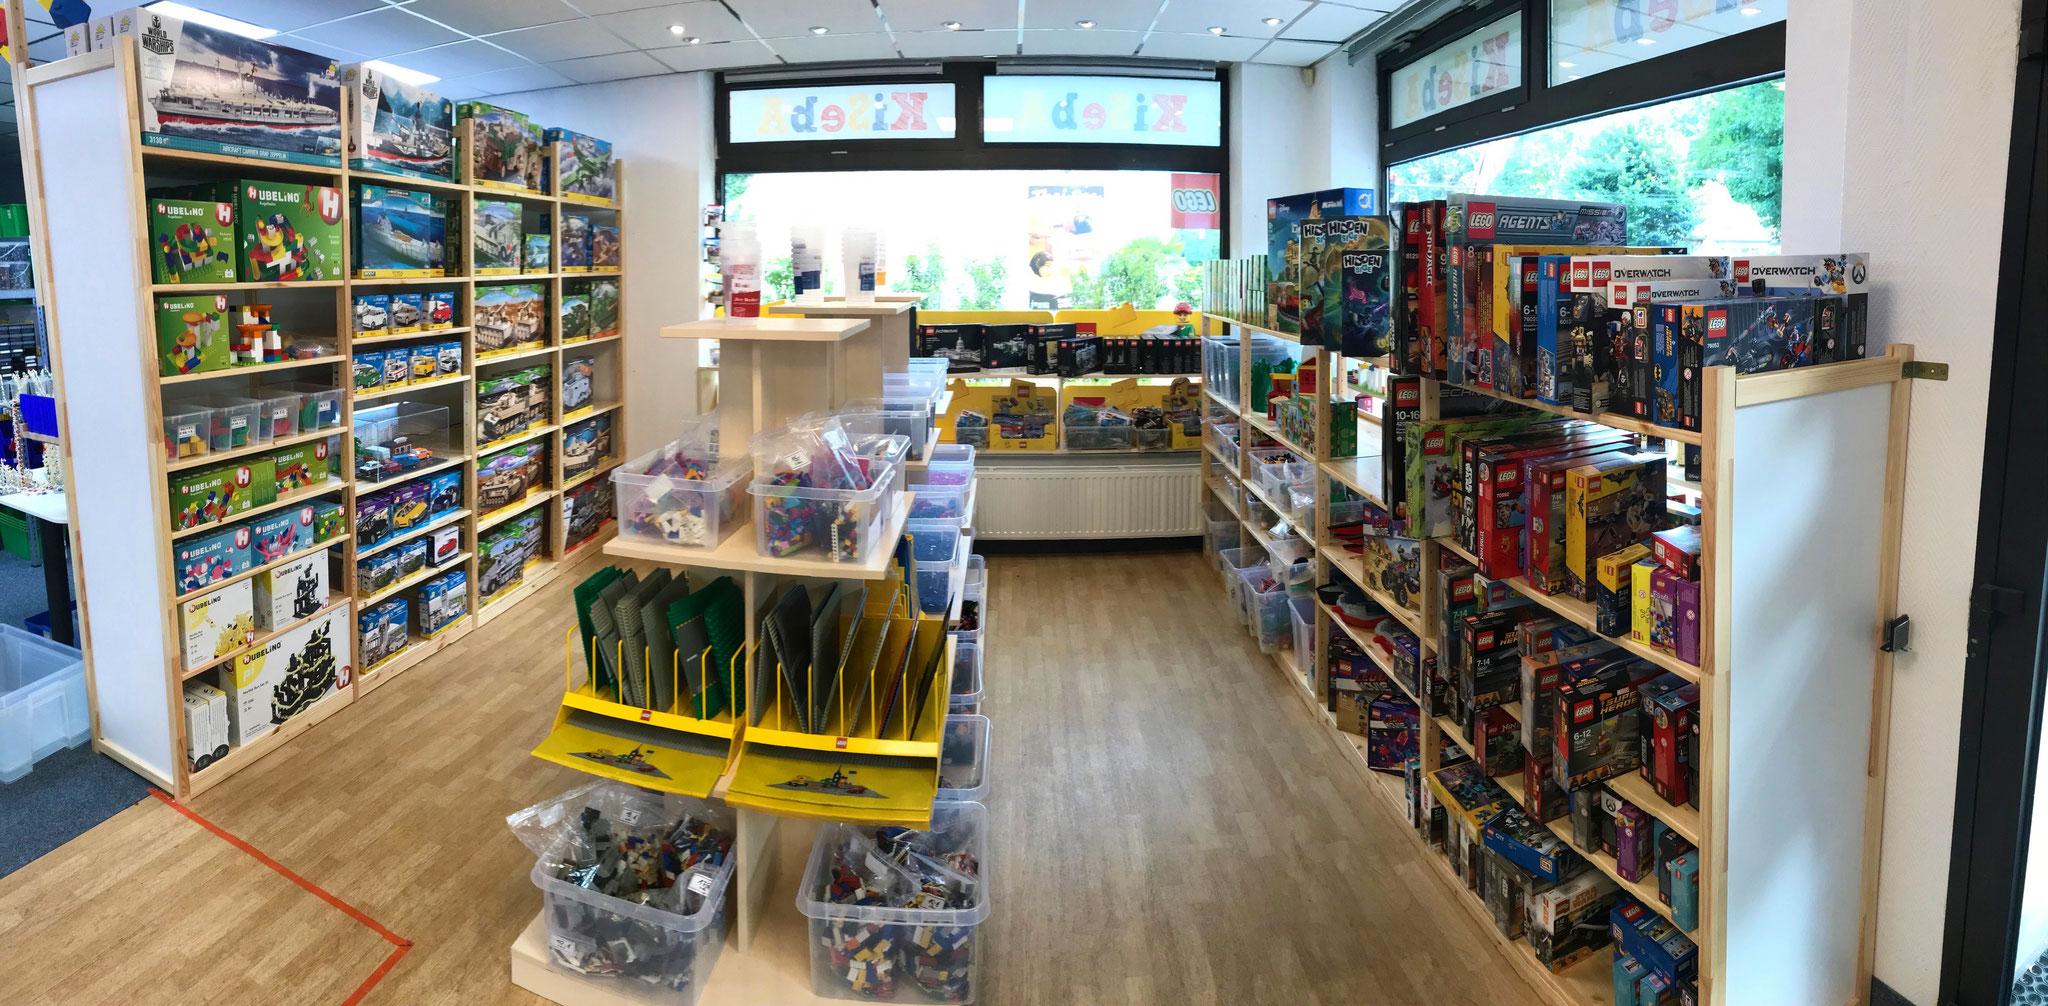 Hubelino - COBI - LEGO Ersatzteile - LEGO Duplo - LEGO Architecture